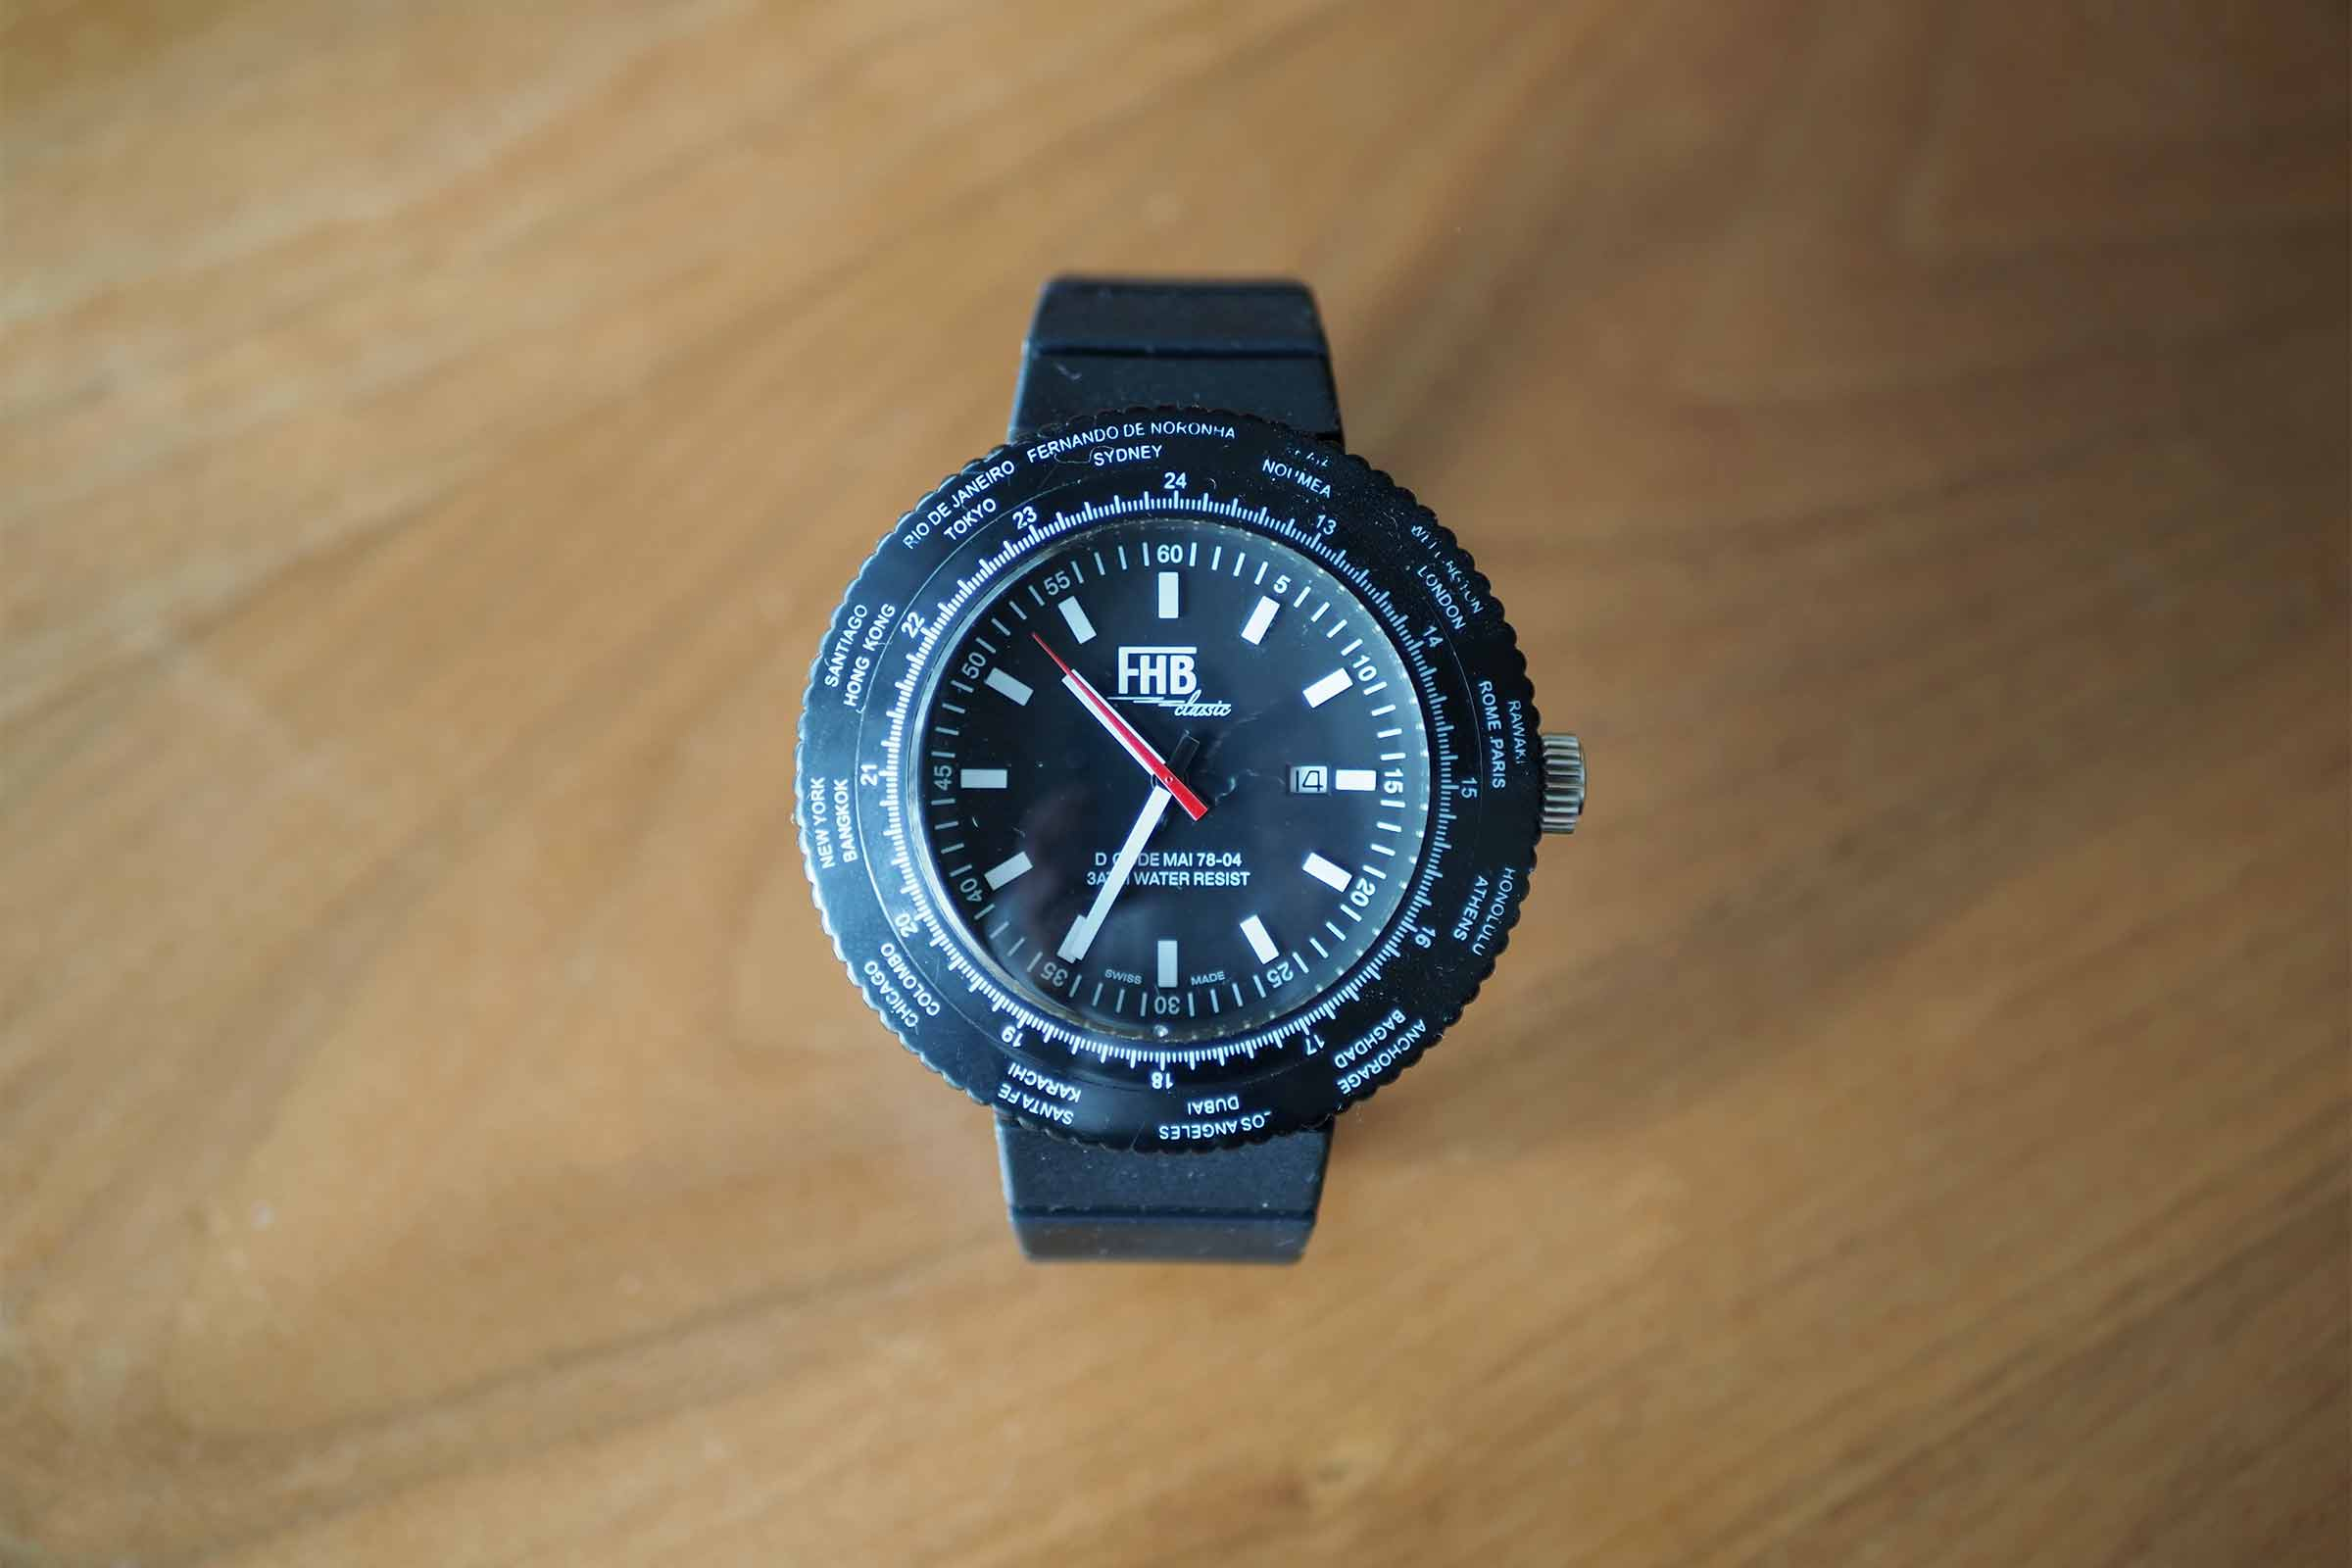 FHB,腕時計,黒,メンズ,ビッグフェイス,お洒落,